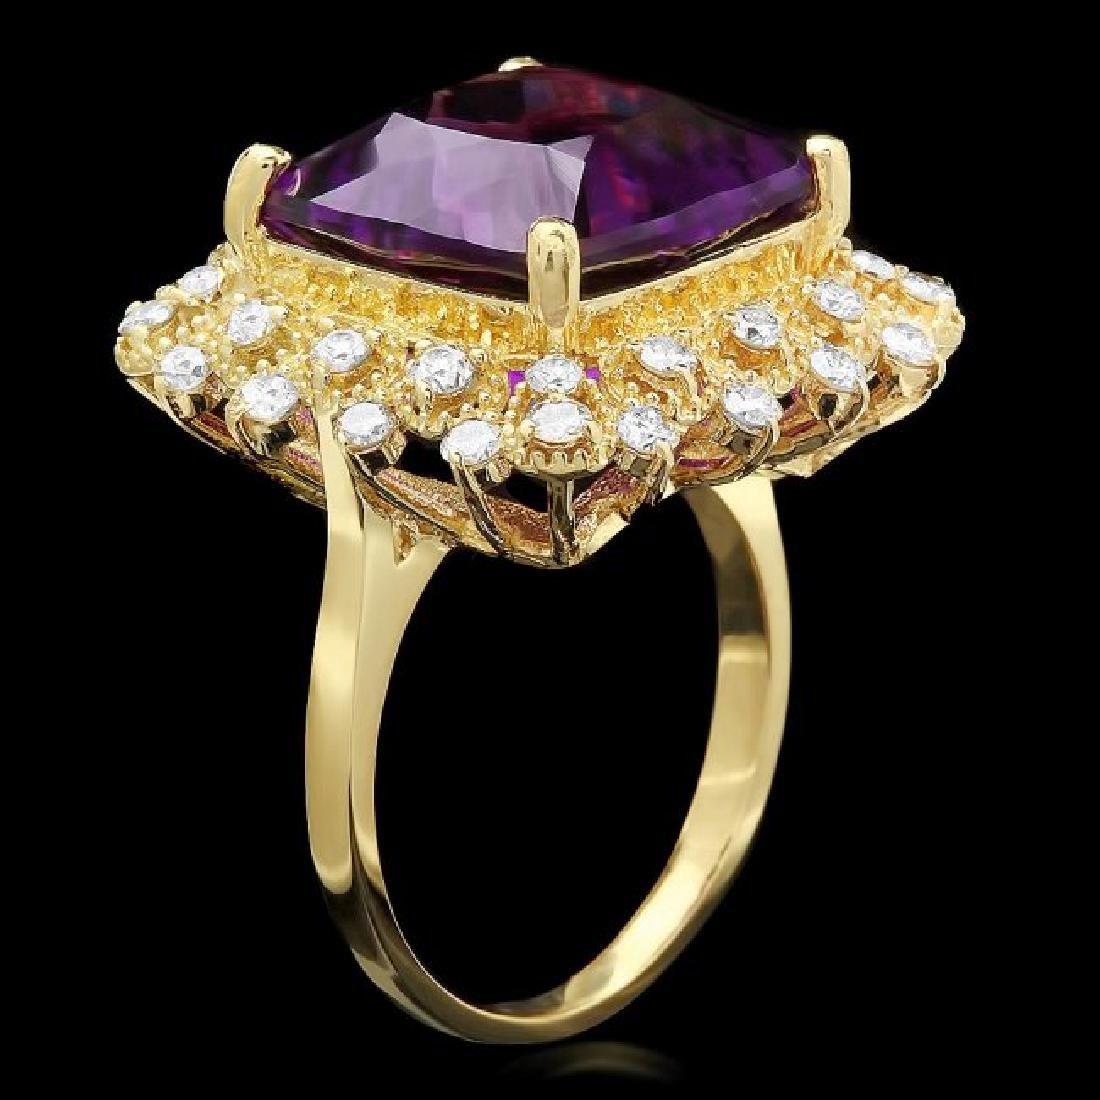 14k Gold 9.32ct Amethyst 0.90ct Diamond Ring - 2